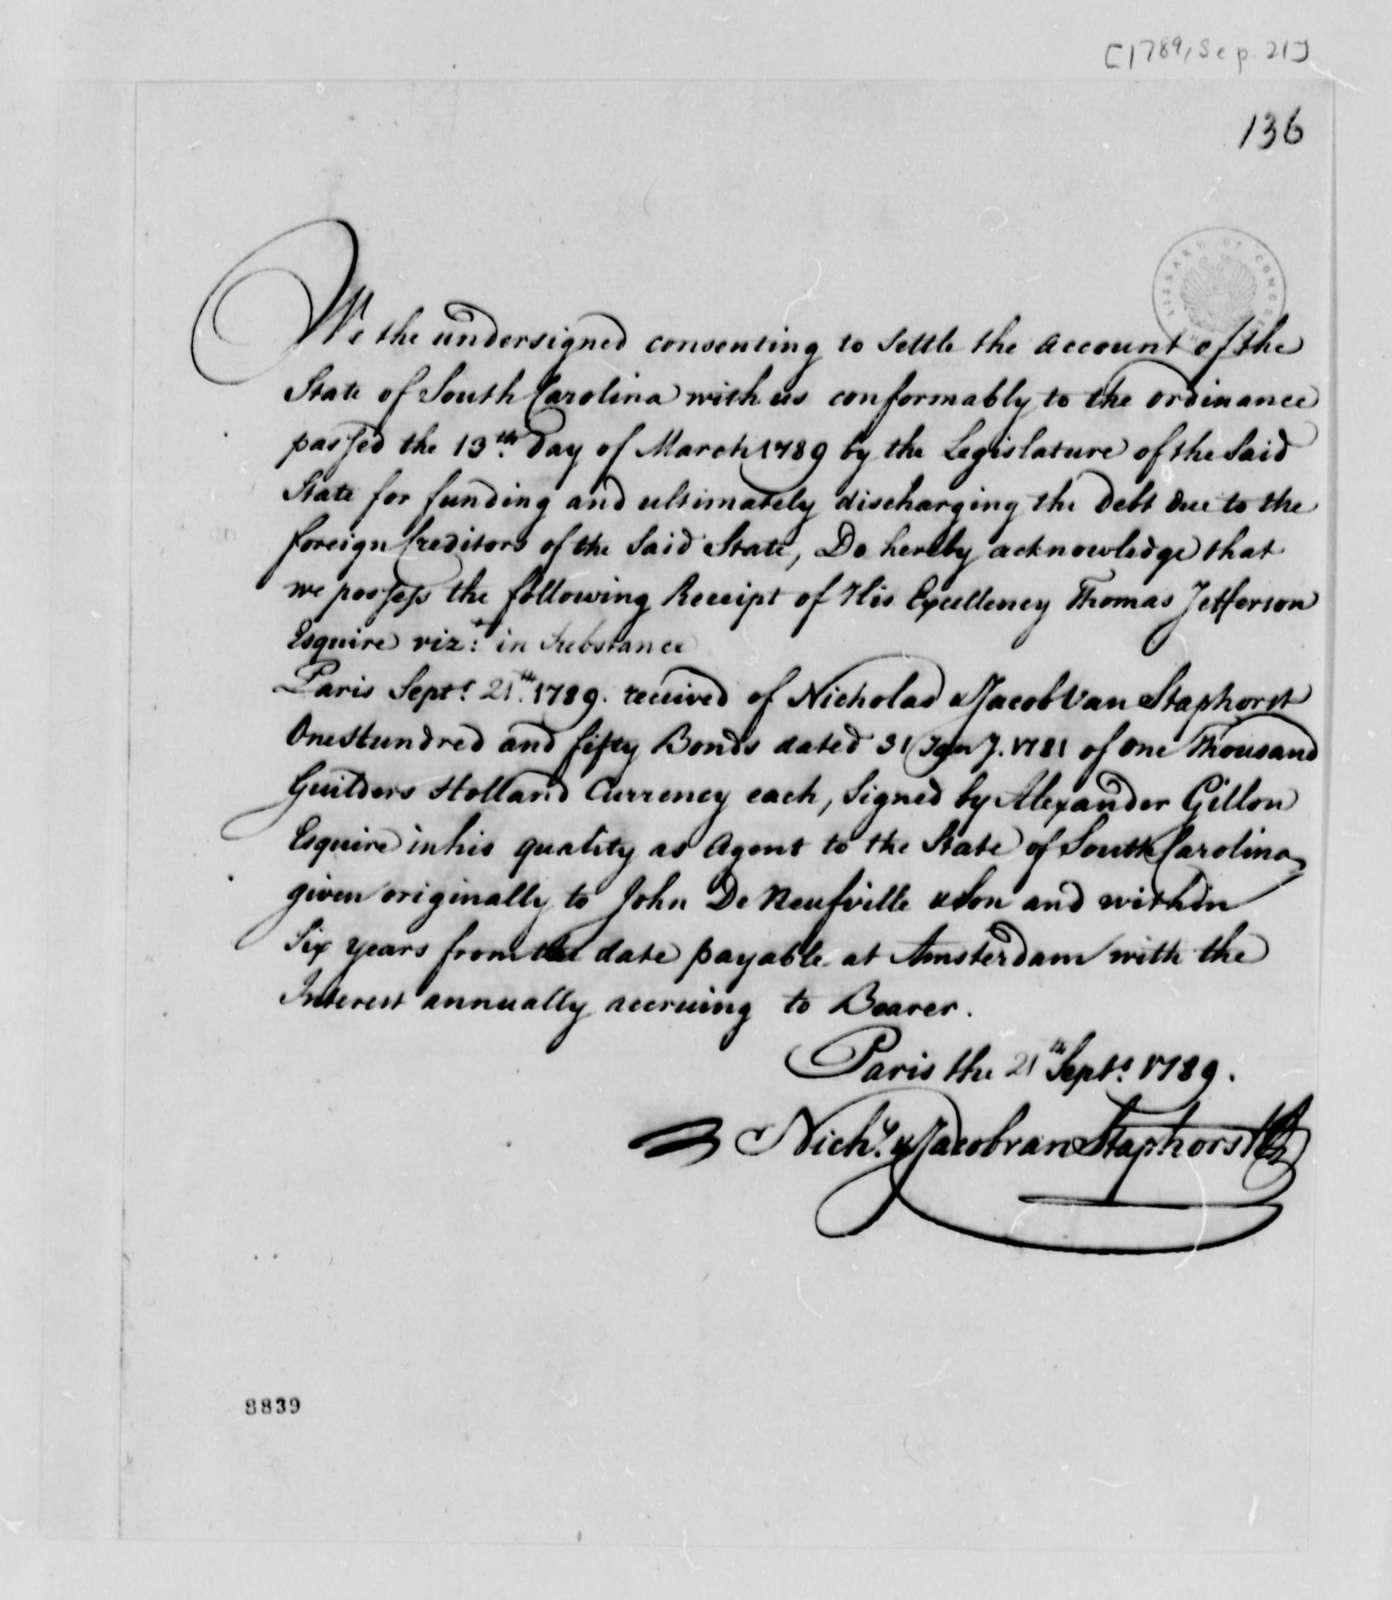 Van Staphorst & Hubbard to Thomas Jefferson, September 21, 1789, with List